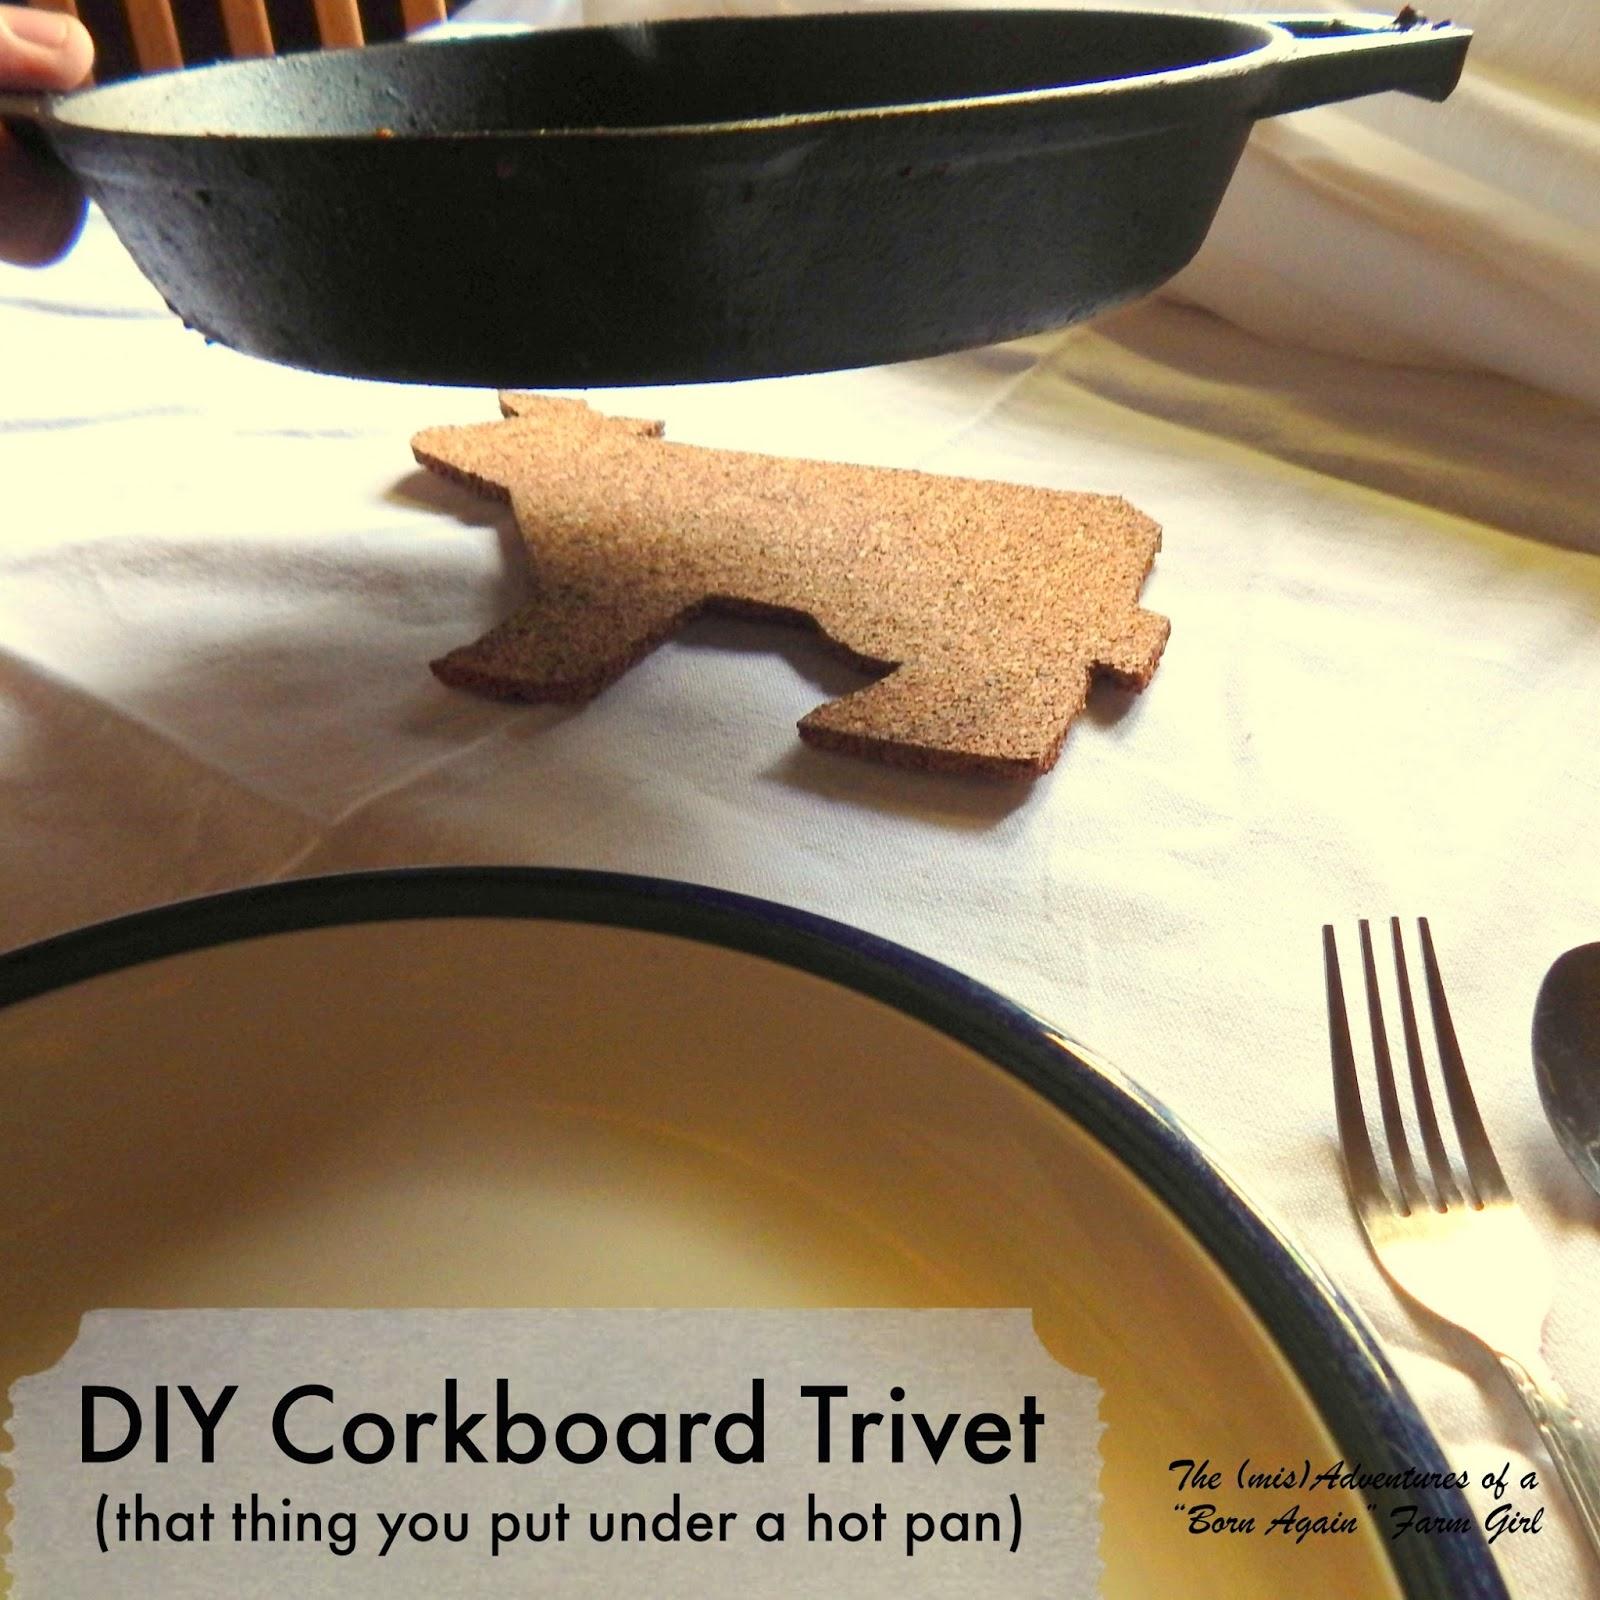 DIY Corkboard Trivet